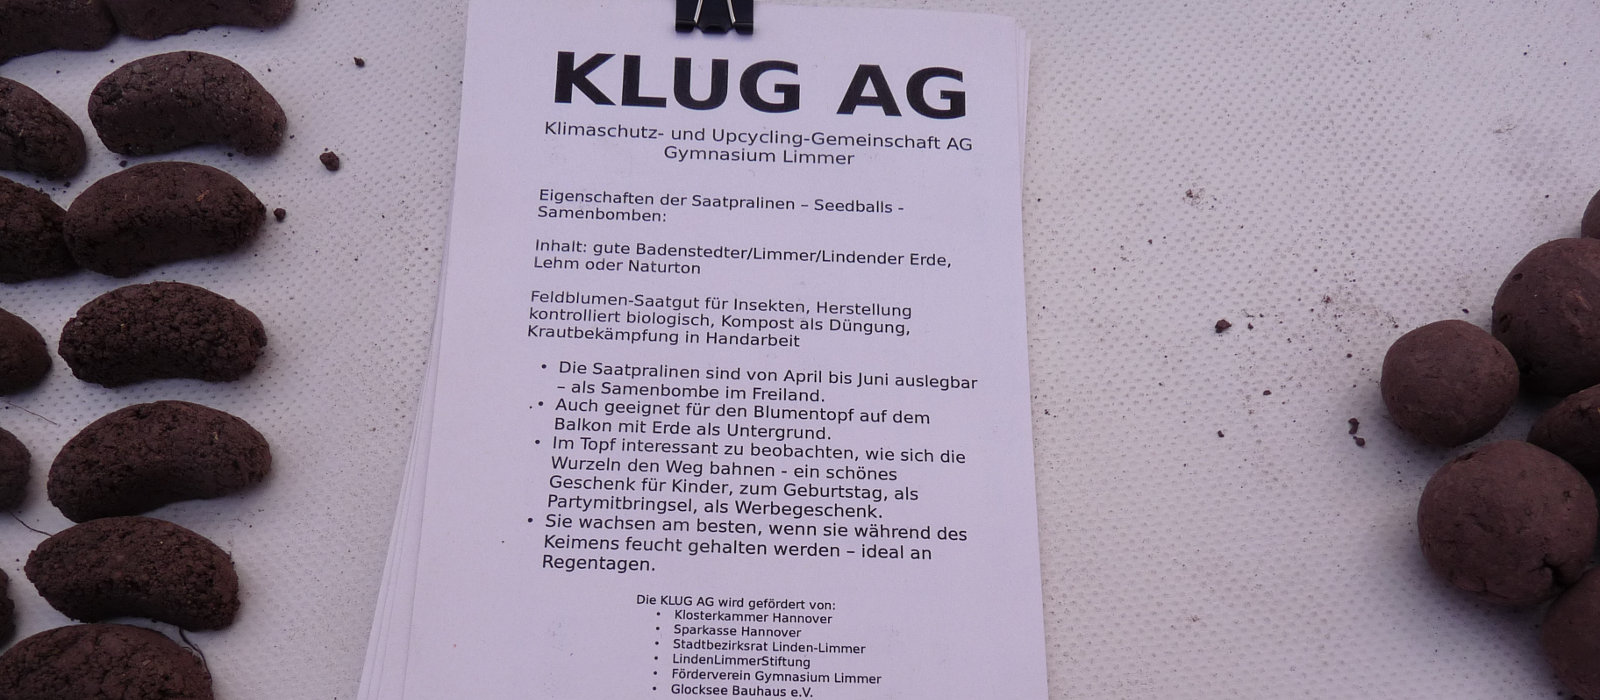 KLUG AG am Gymnasium Limmer mit Windwärts-Spende beflügelt